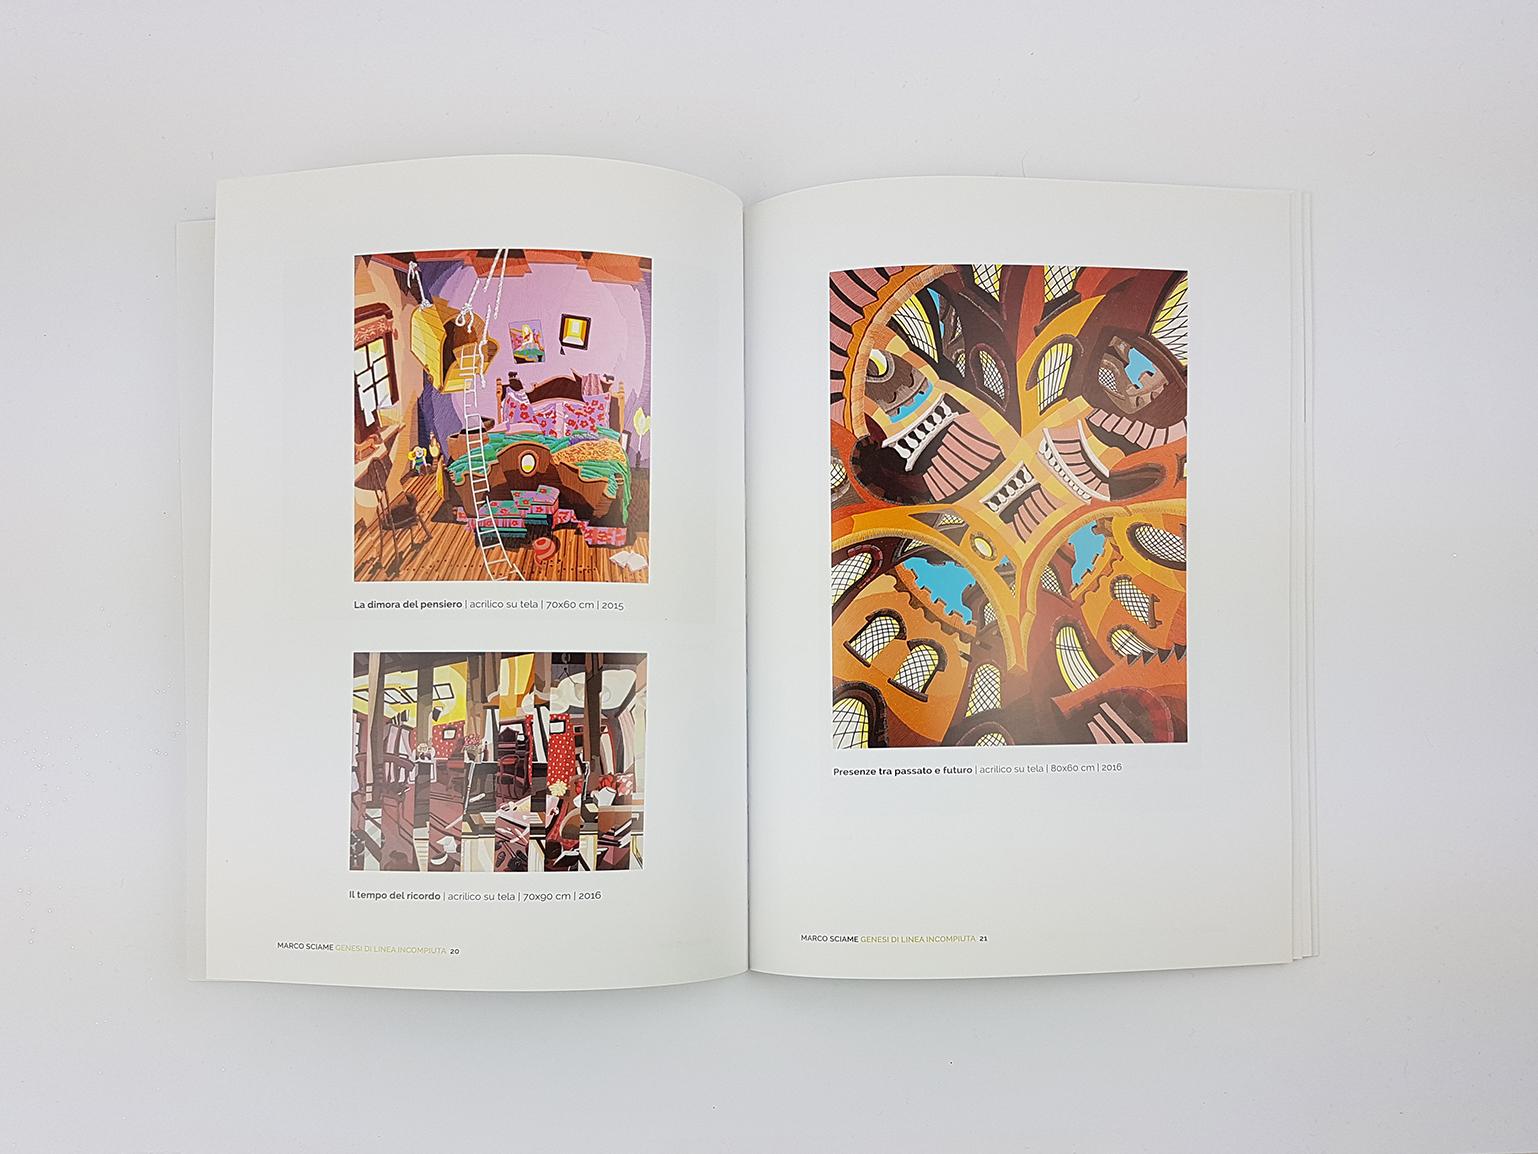 684fec45c6f1 Catalogo d arte per l artista Marco Sciame - Dangeloweb di Valentina ...